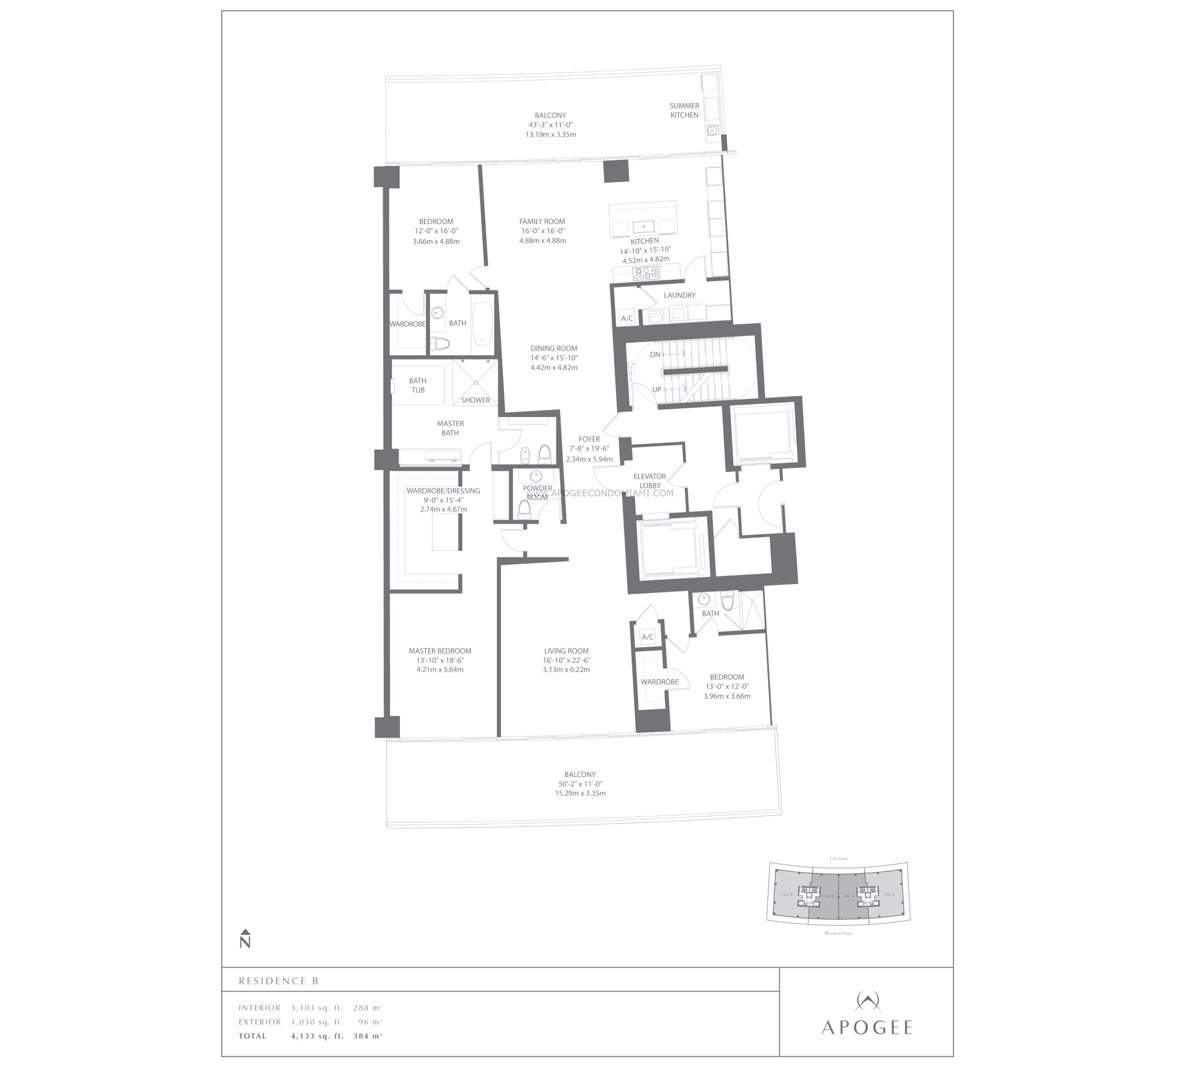 Floor plan image Residence B - 3/3/1  - 3103 sqft image